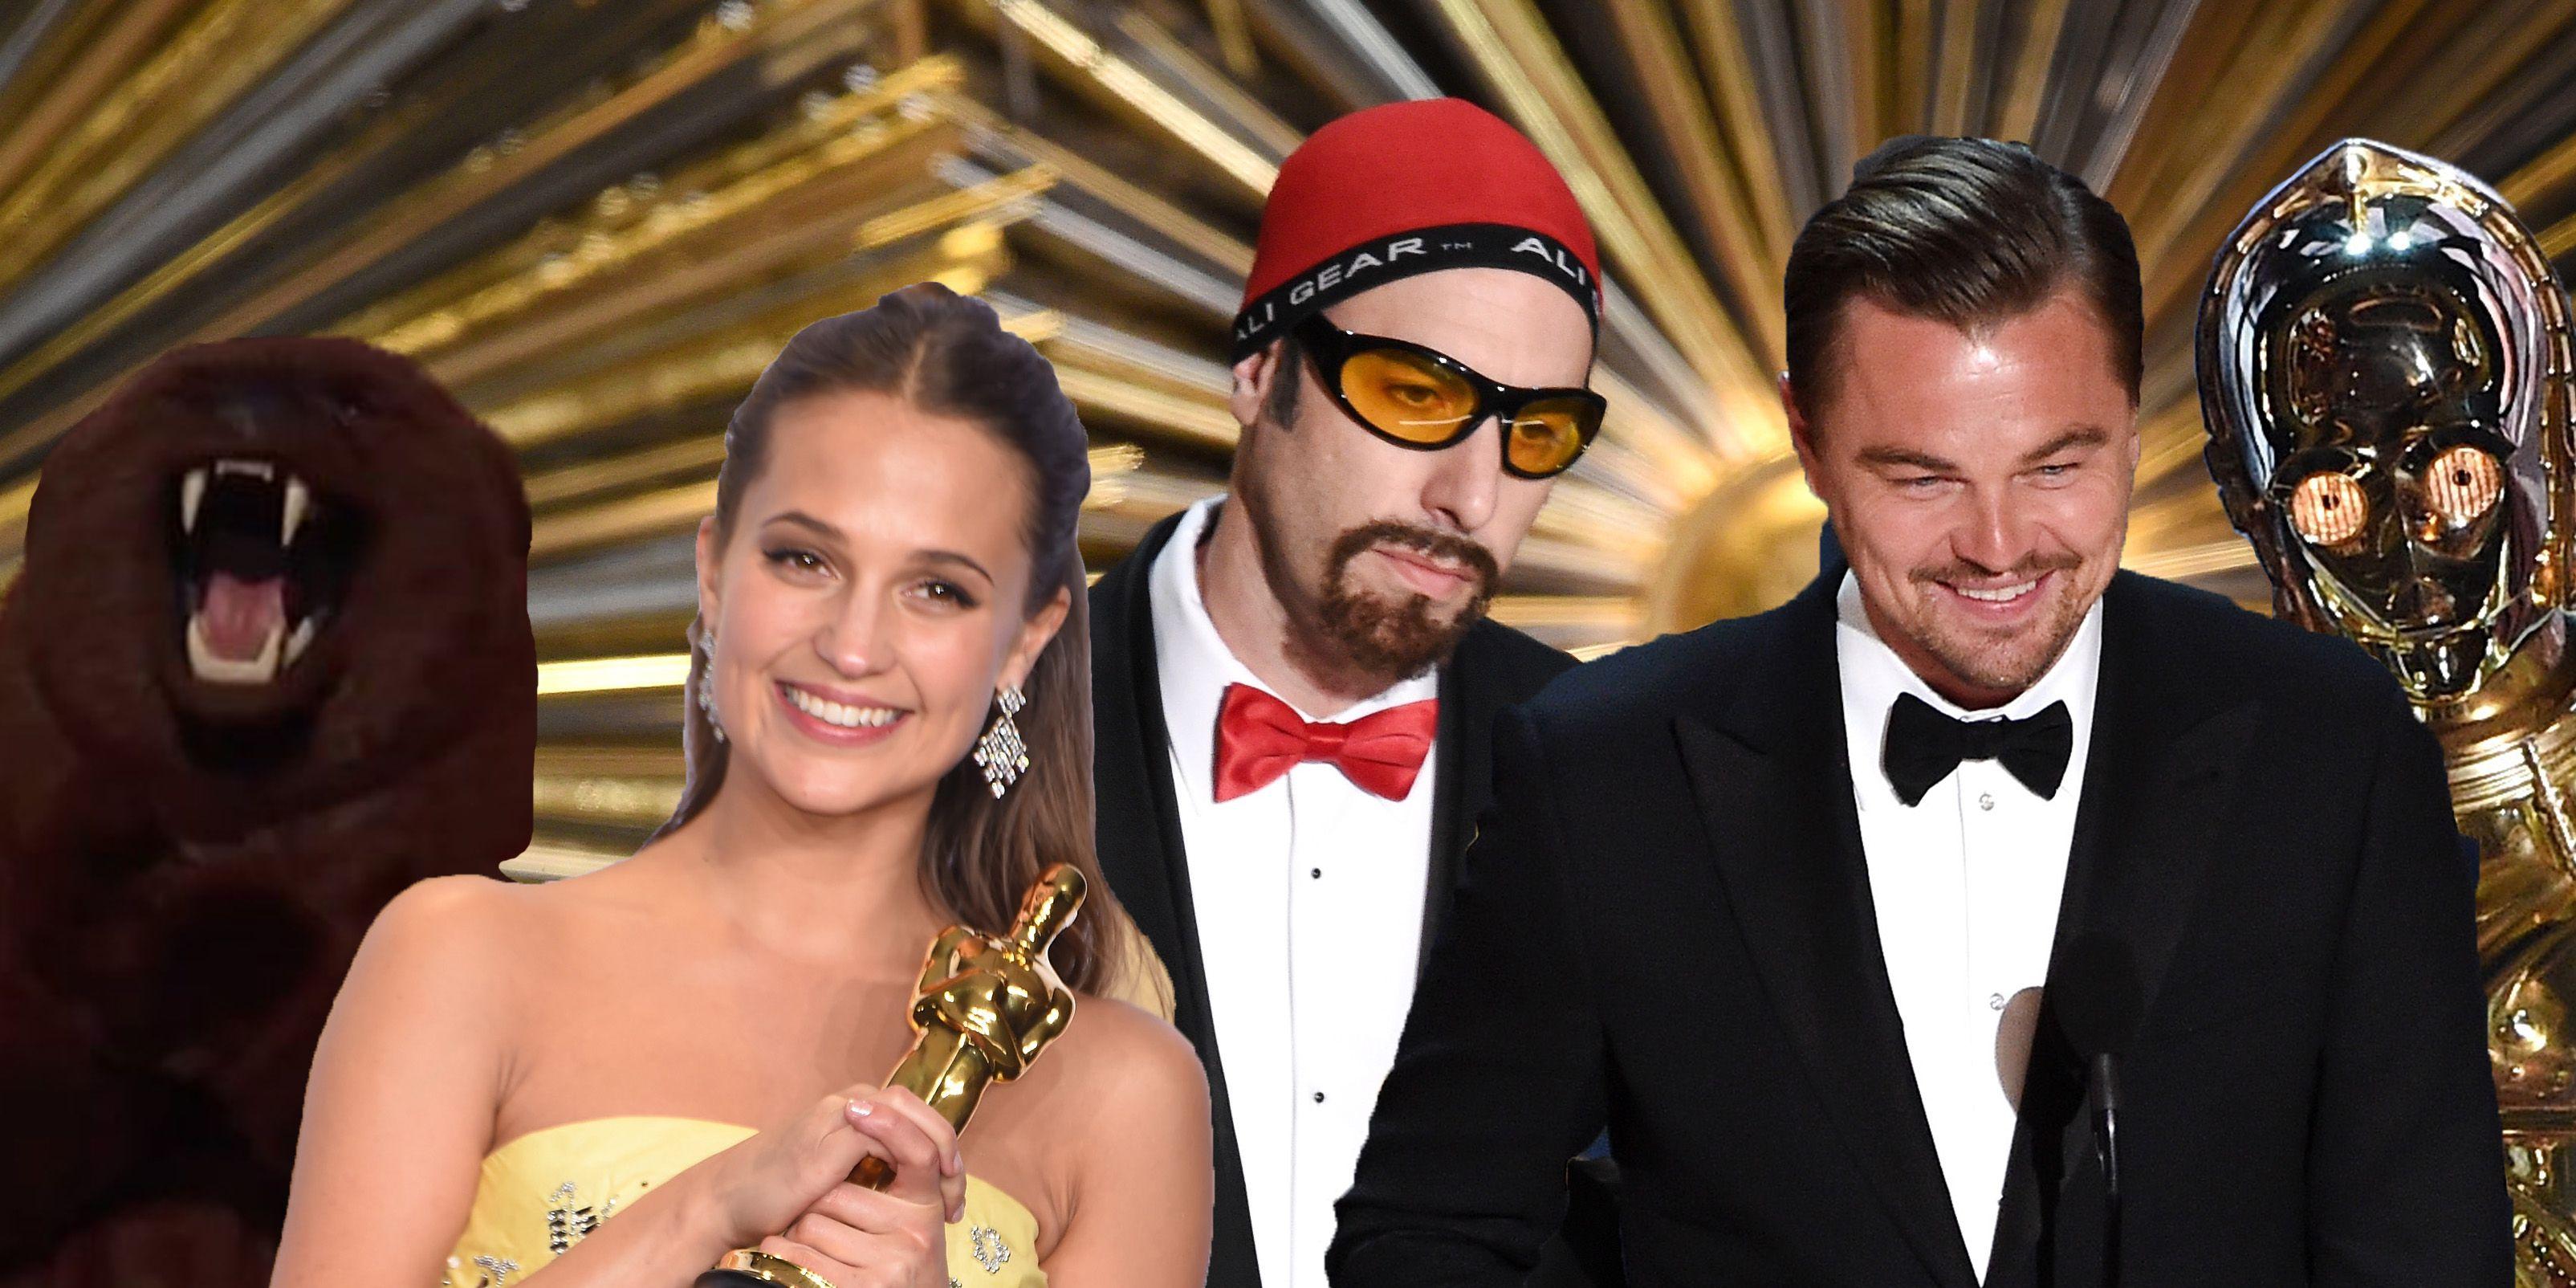 Oscars Bear, Alicia Vikander, Ali G, Sacha Baron Cohen, Leonardo DiCaprio, C-3PO Star Wars